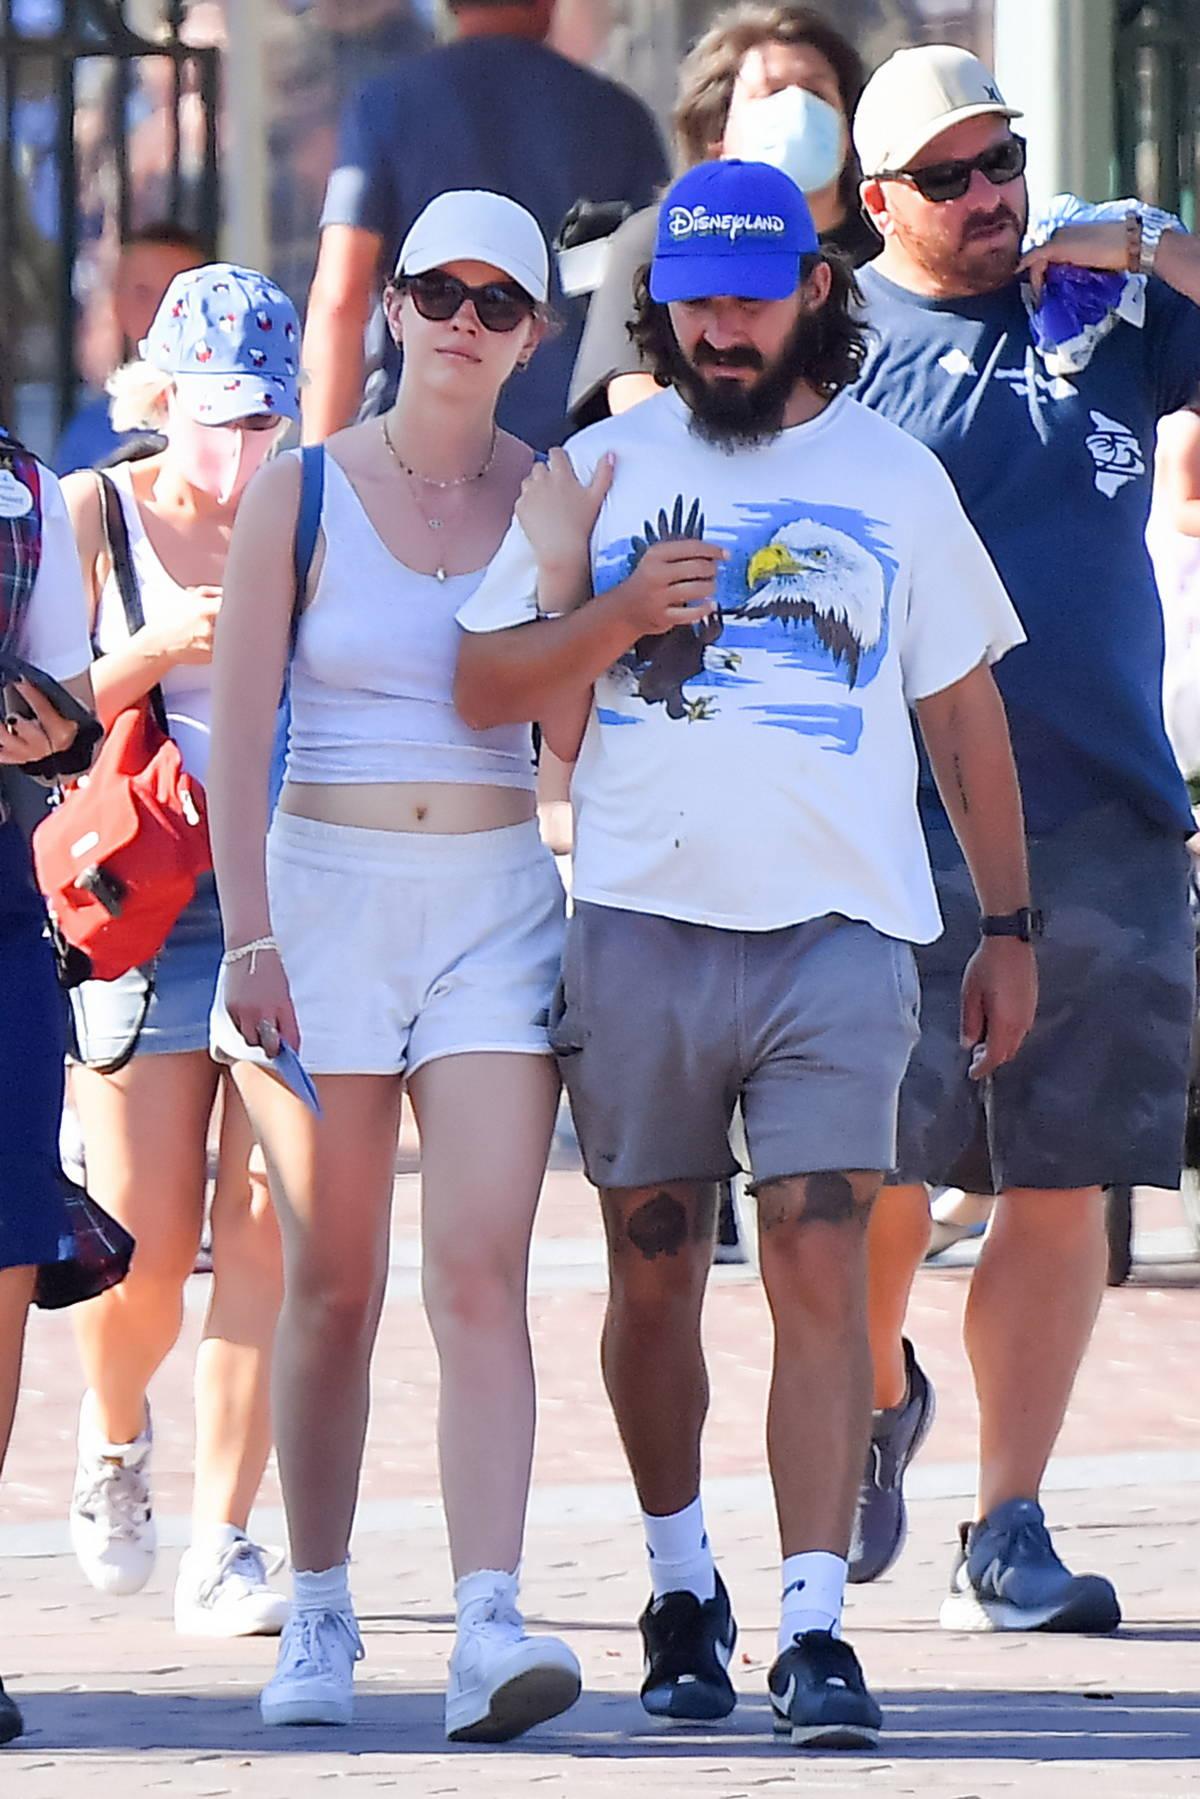 Mia Goth and Shia LaBeouf walk arm in arm while enjoying a day at Disneyland in Anaheim, California